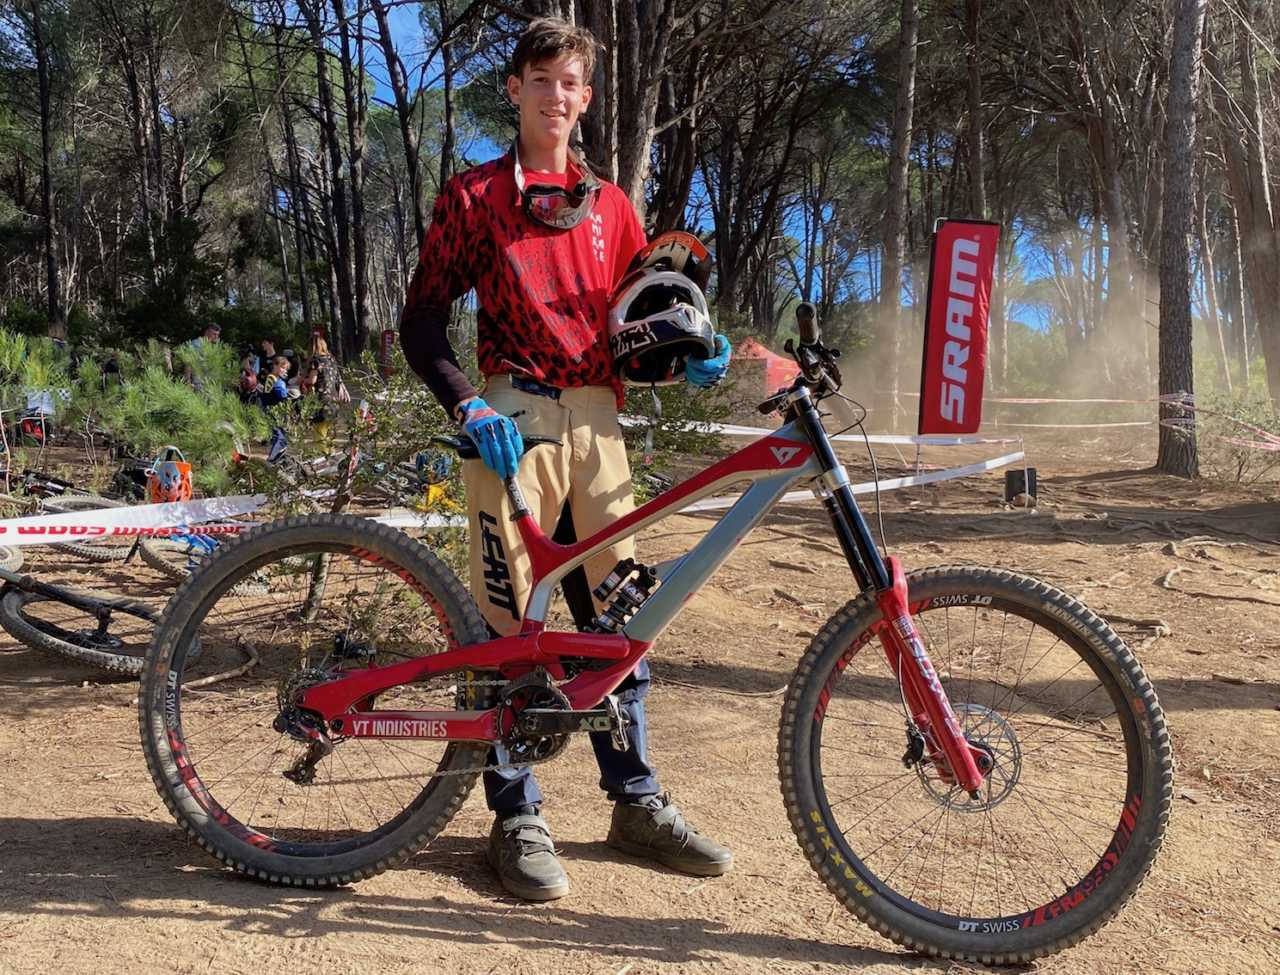 mathew-van-rosenveld-mountain-bike-paarl-bike-network-western-cape-downhill